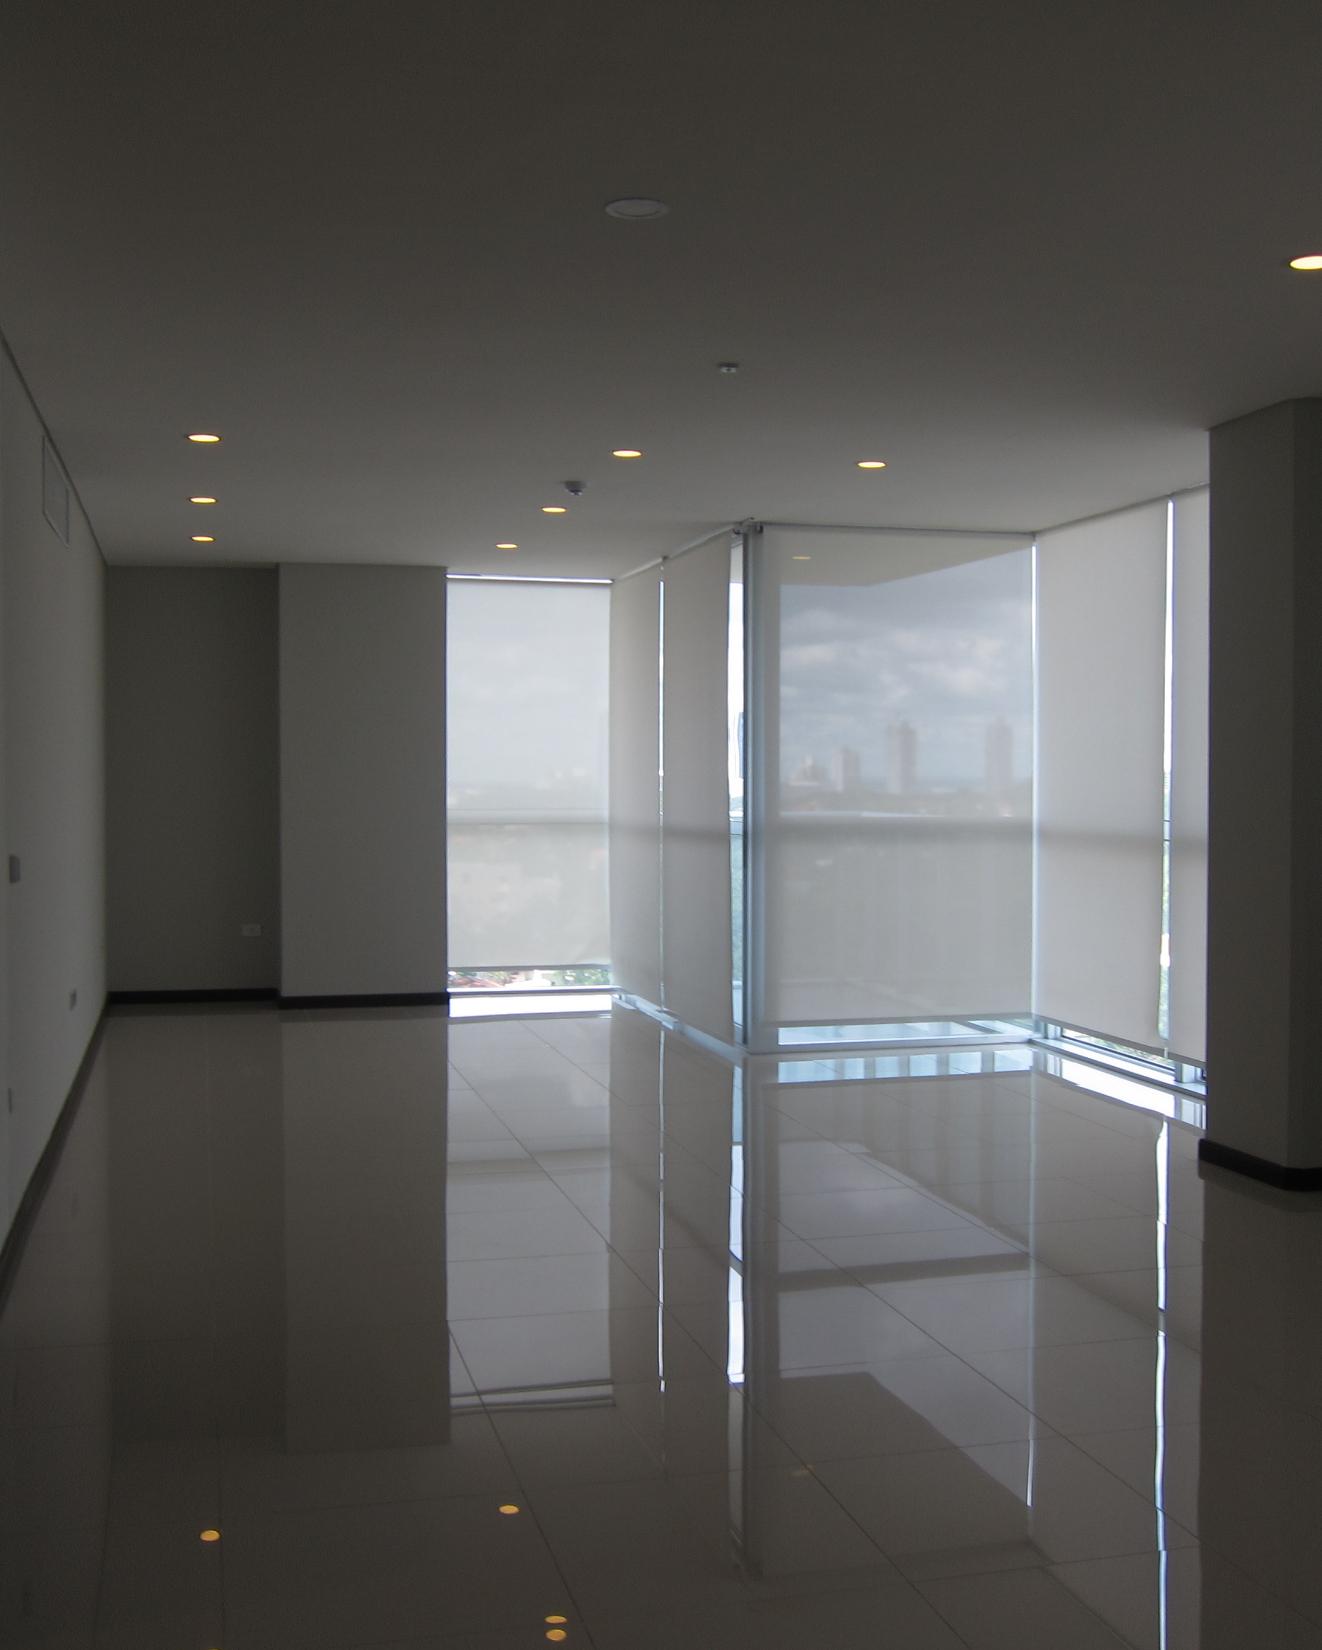 Vendo Dpto. A Estrenar Tres Dormit. Edif. Miami Tower